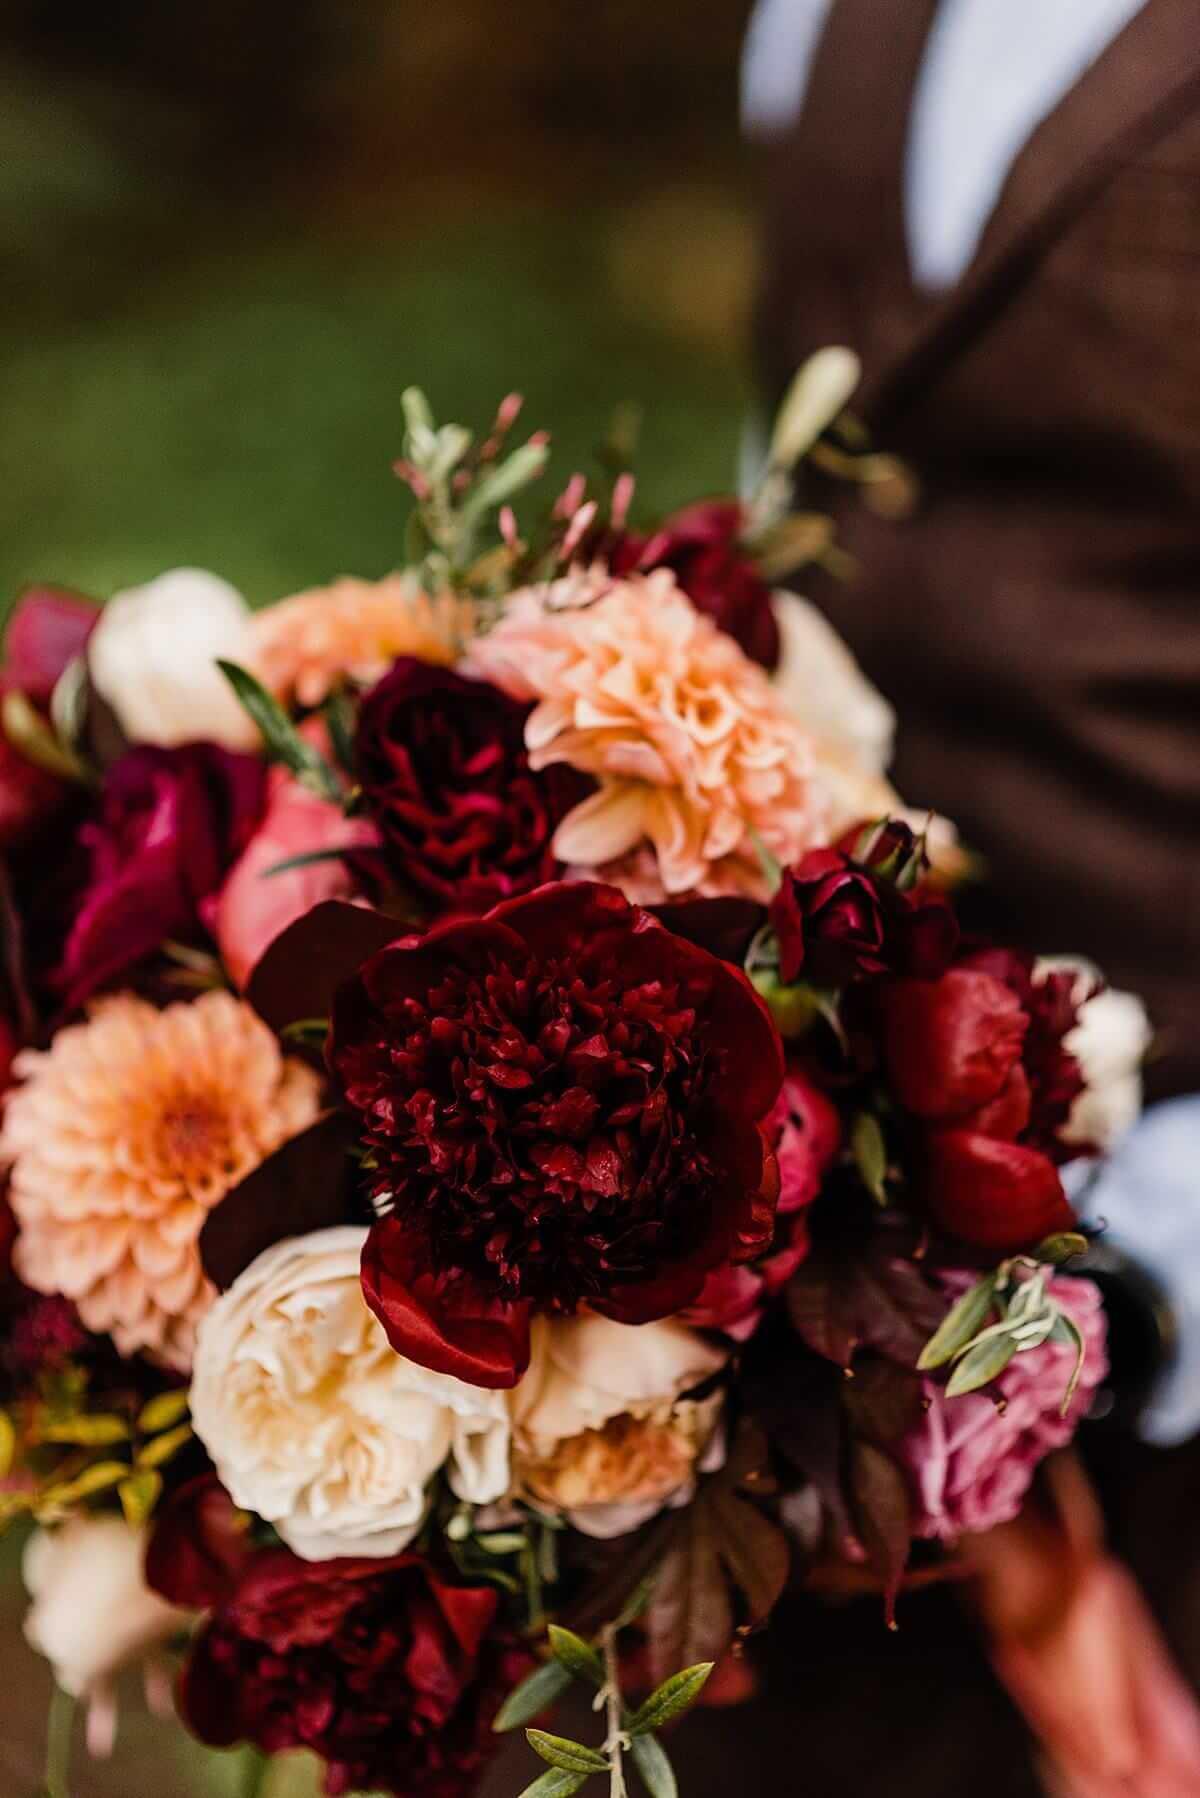 Allison-Brooks-Jedediah-Smiith-Redwoods-Adventure-Elopement-Wedding-S-Photography-Blog_0018.jpg